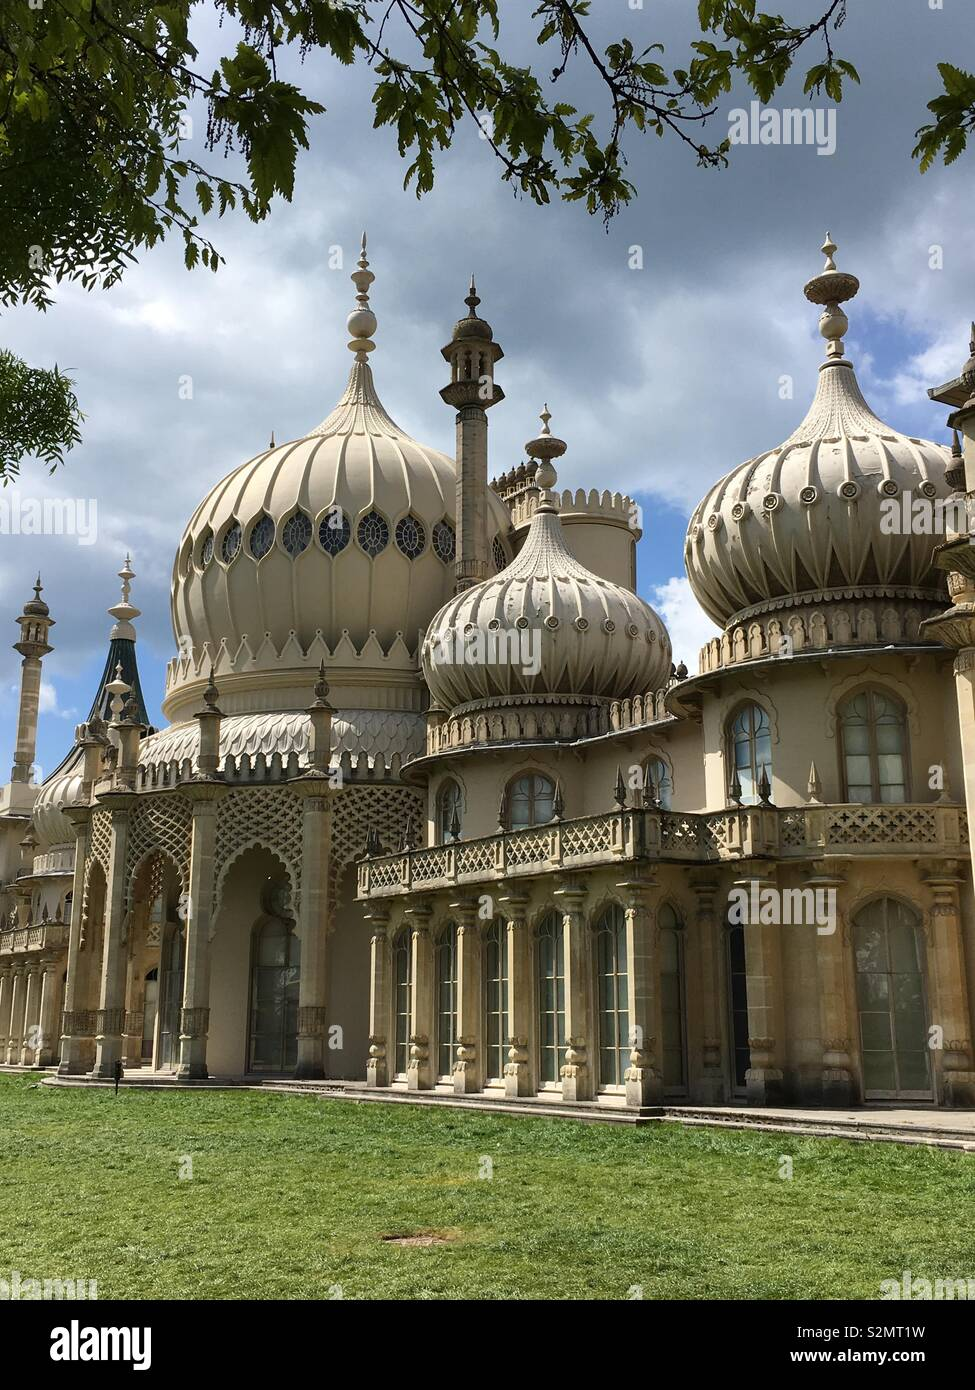 Royal Pavilion Gardens, Brighton - Stock Image